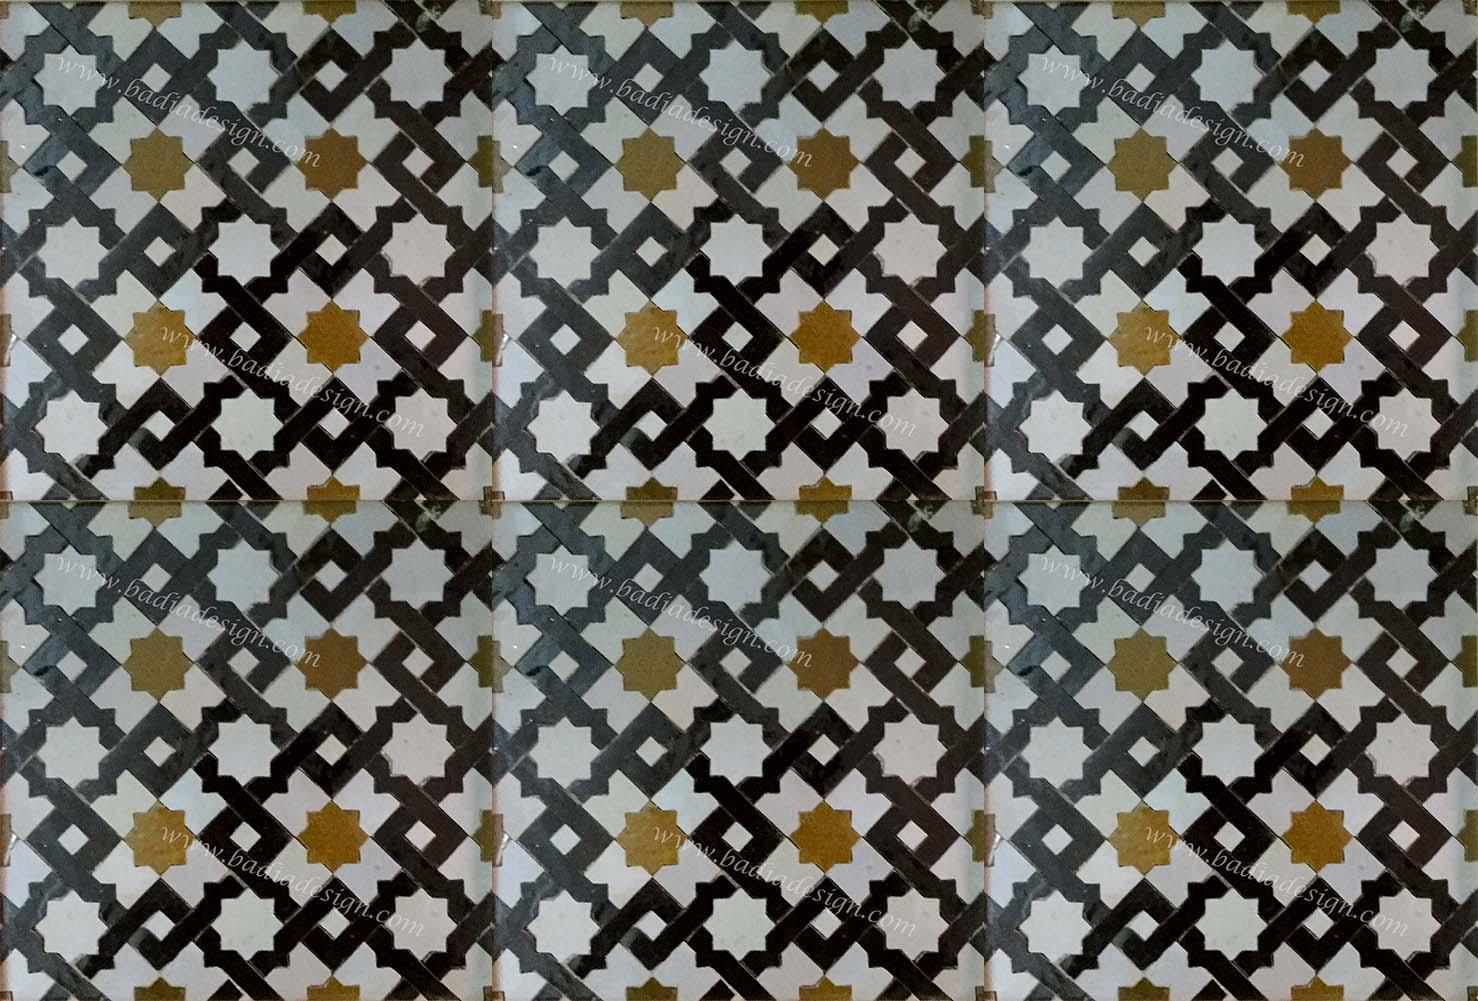 Moroccan Mosaic Tile